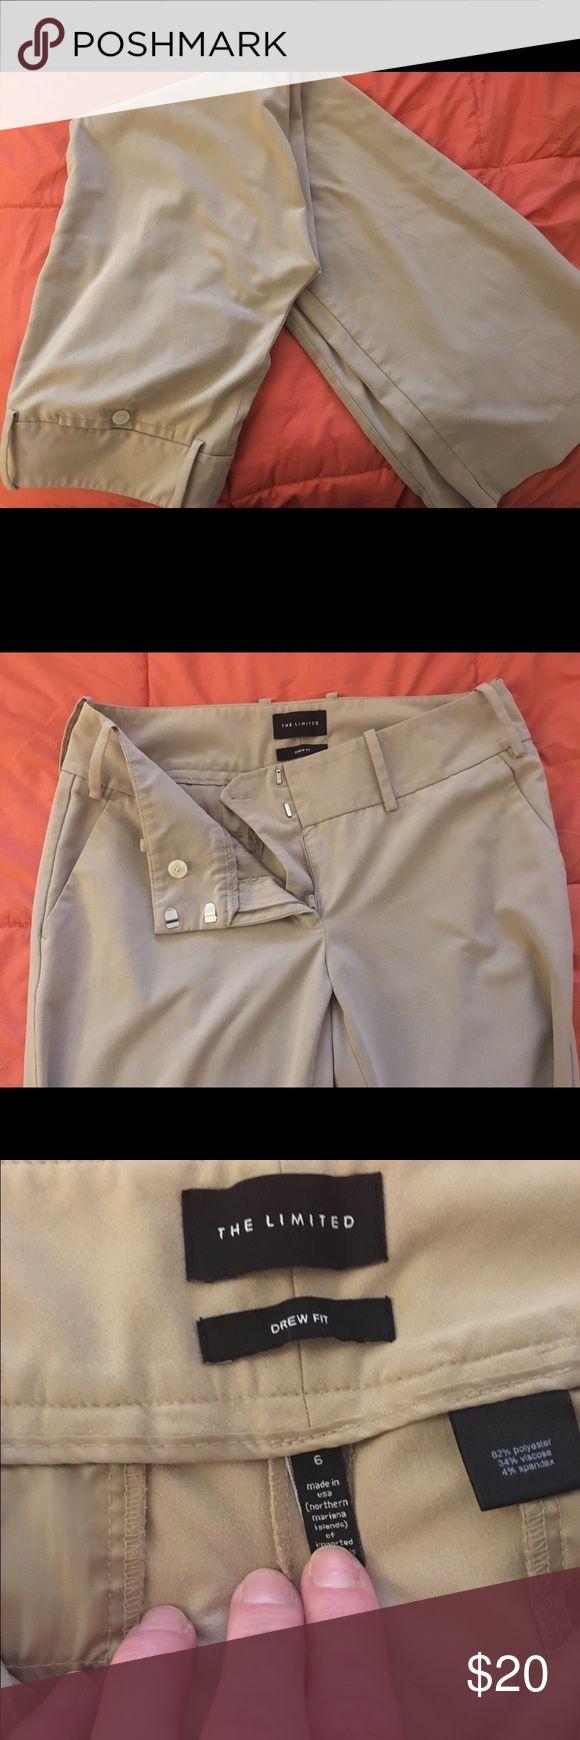 Khaki slacks Size six khaki slacks. Drew fit from The Limited. Flare leg, mid waist fit The Limited Pants Trousers